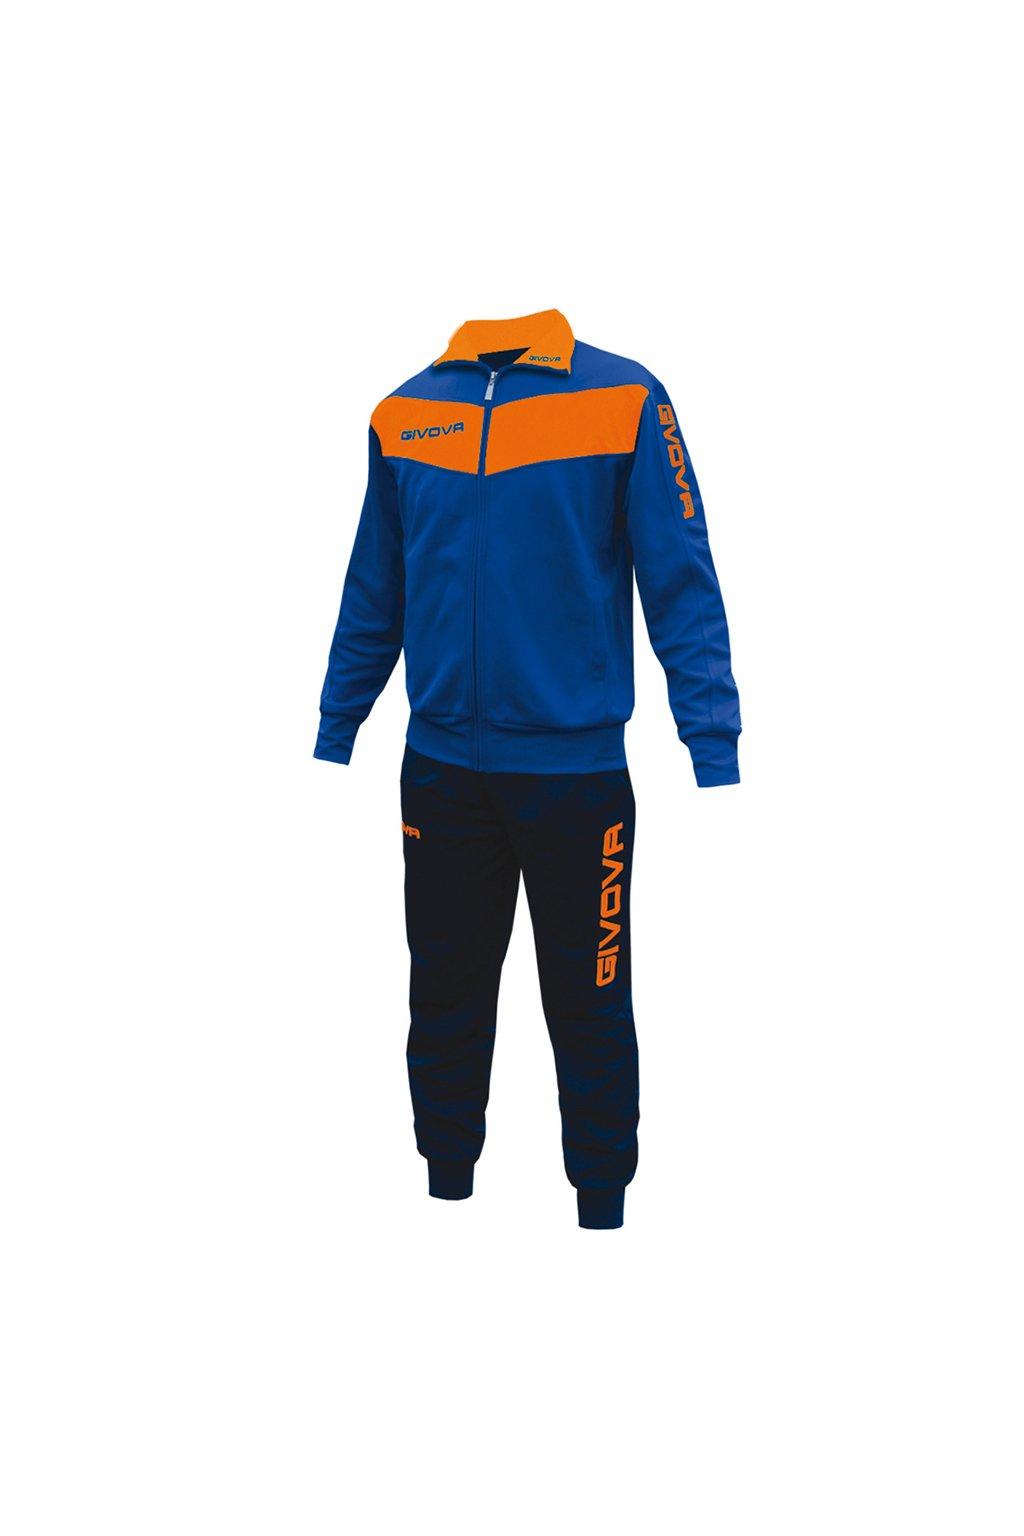 Súprava Givova Tuta Visa Fluo modro oranžová TR018F 0228